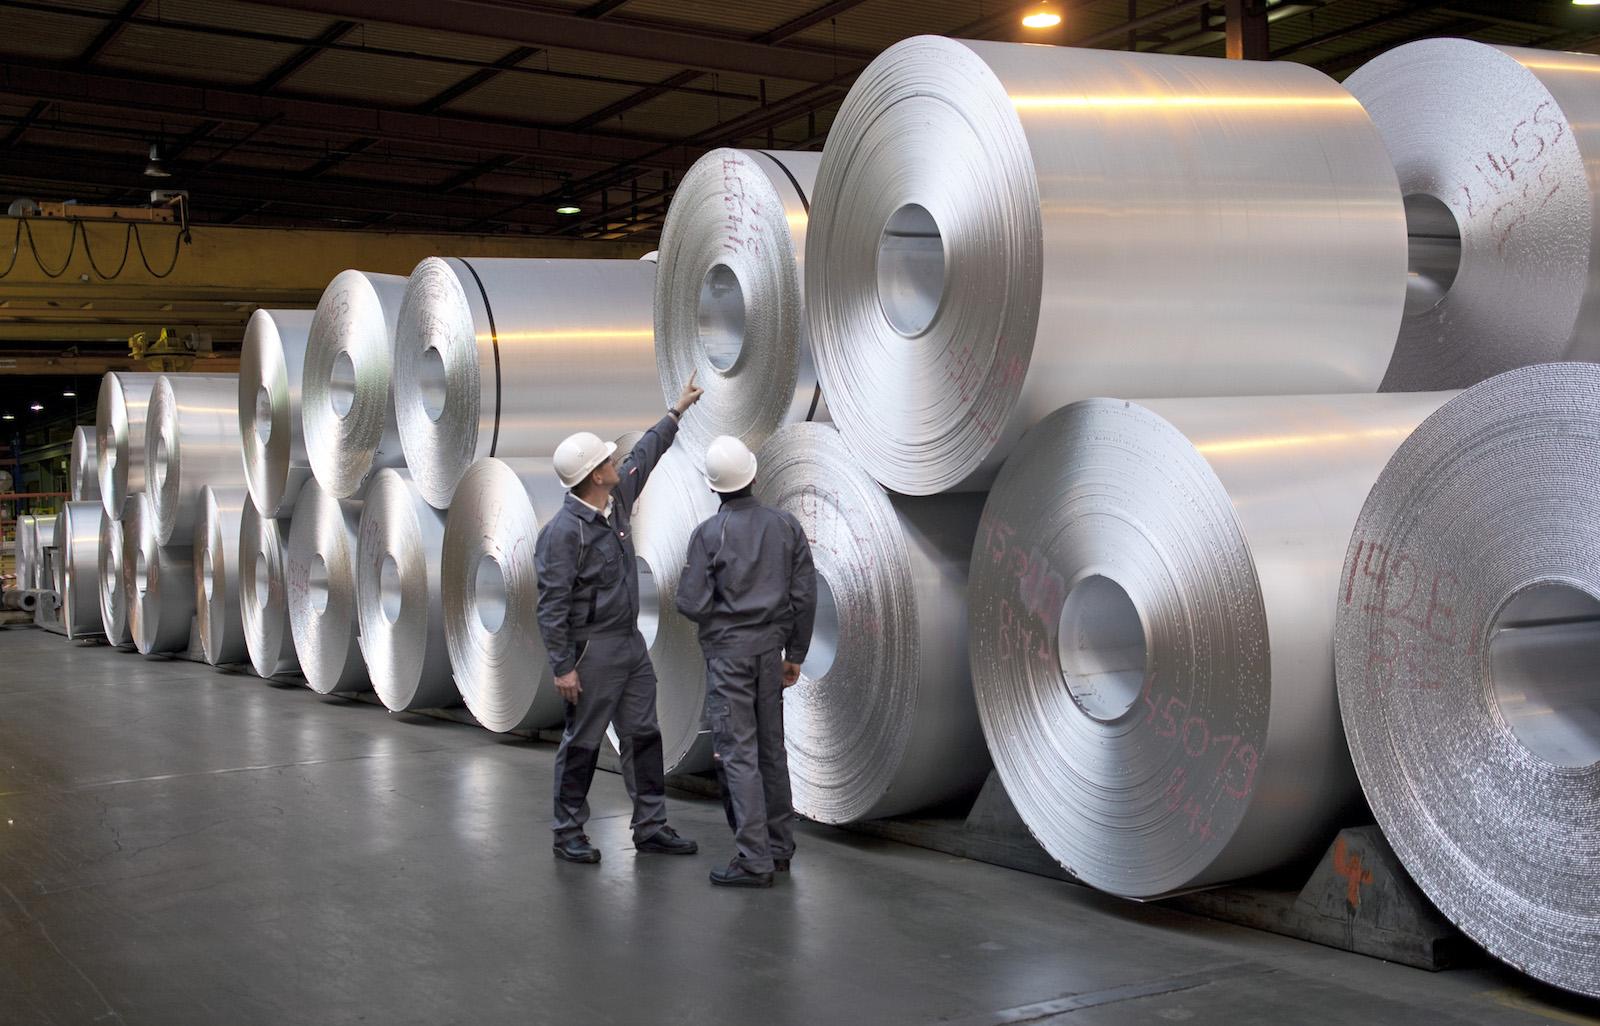 2018 aluminium foil industry in americas Global aluminum foil packaging market in food and beverages industry 2018-2022 about aluminum foil packaging in food and beverages industry aluminium product.